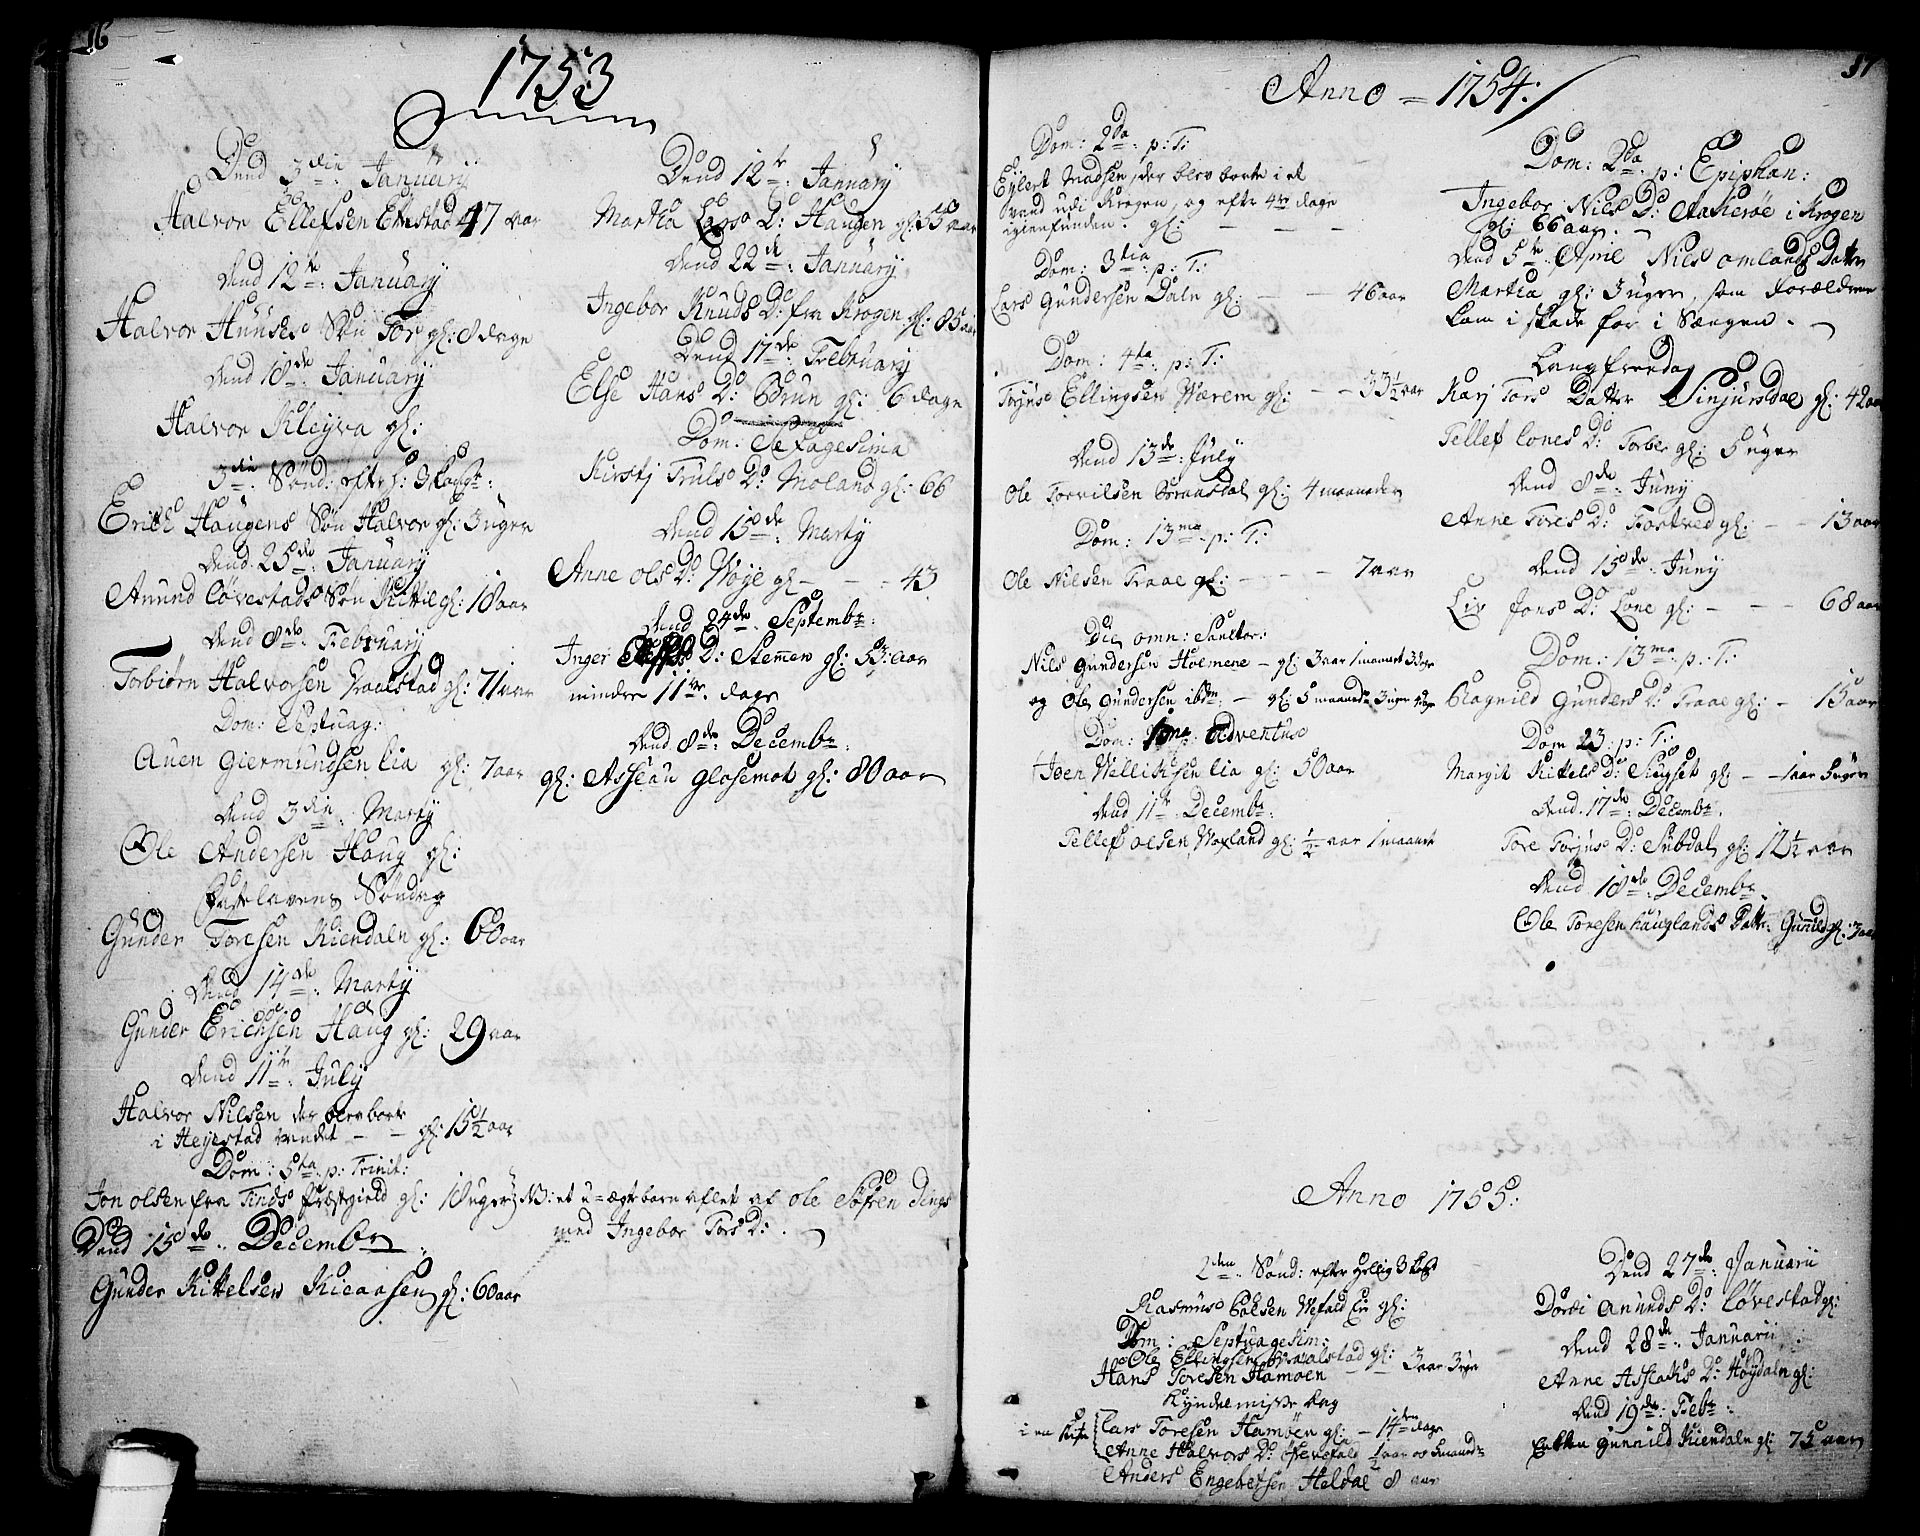 SAKO, Drangedal kirkebøker, F/Fa/L0001: Ministerialbok nr. 1, 1697-1767, s. 16-17